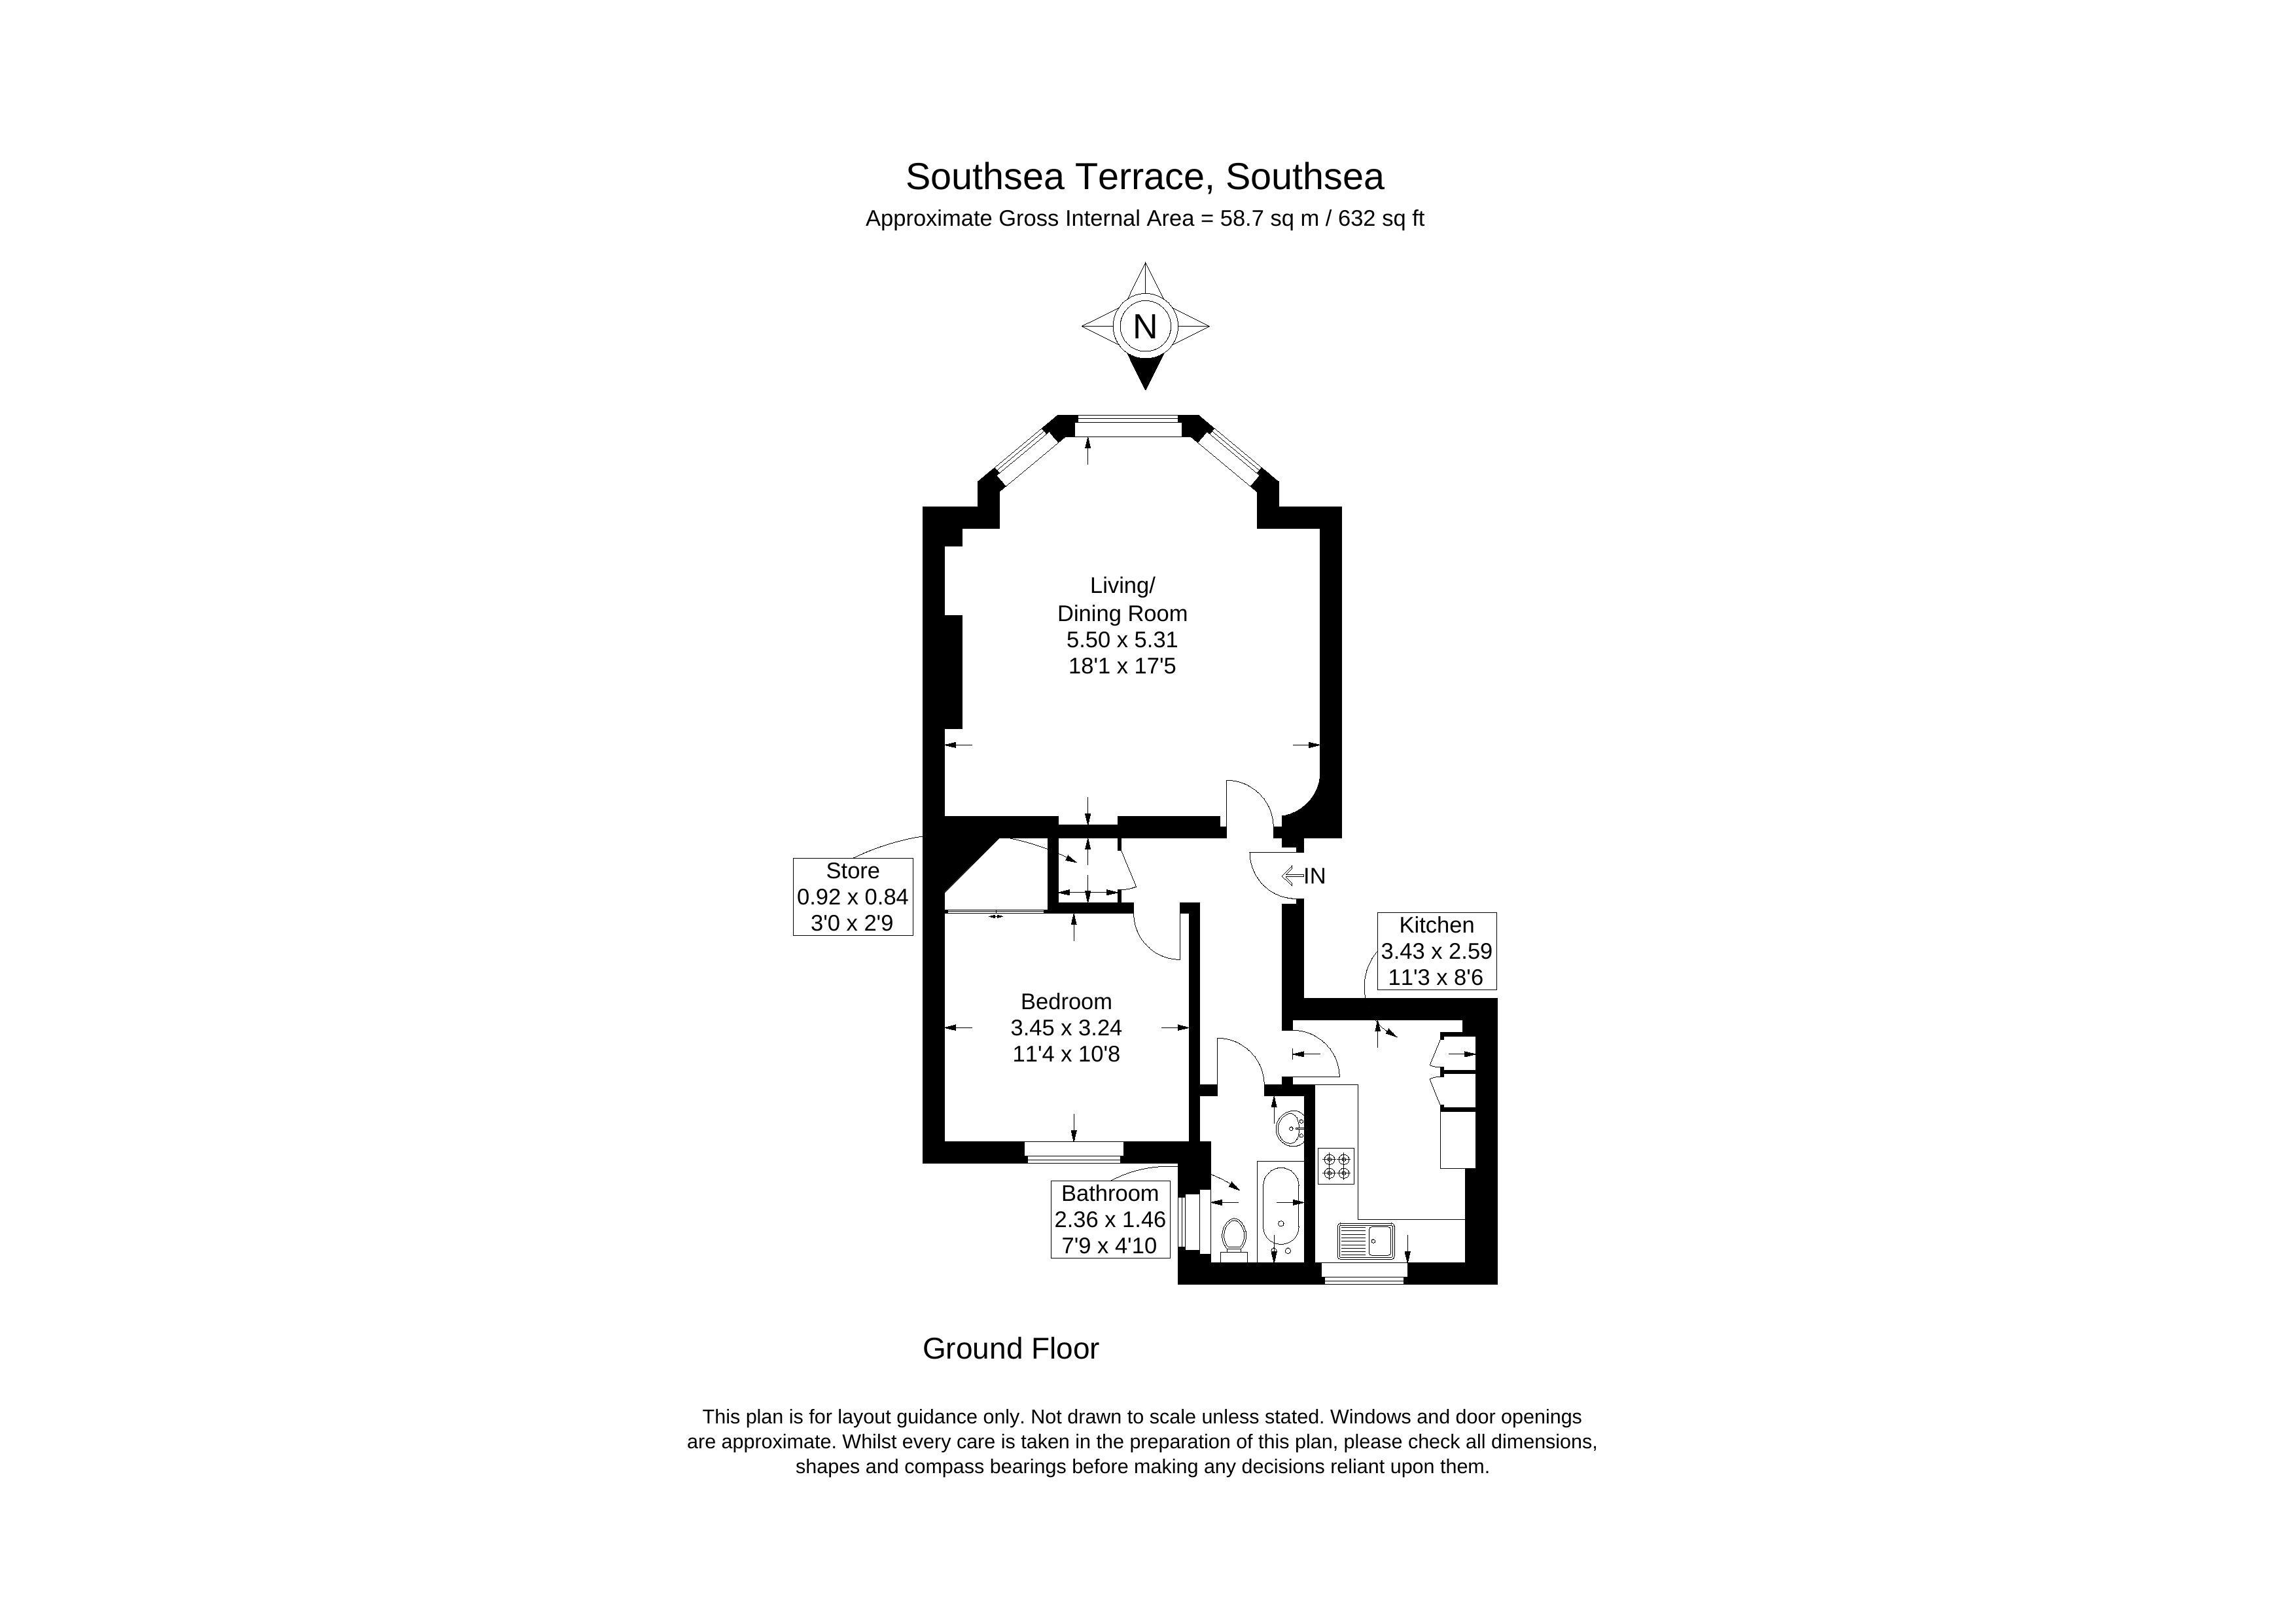 Southsea Terrace